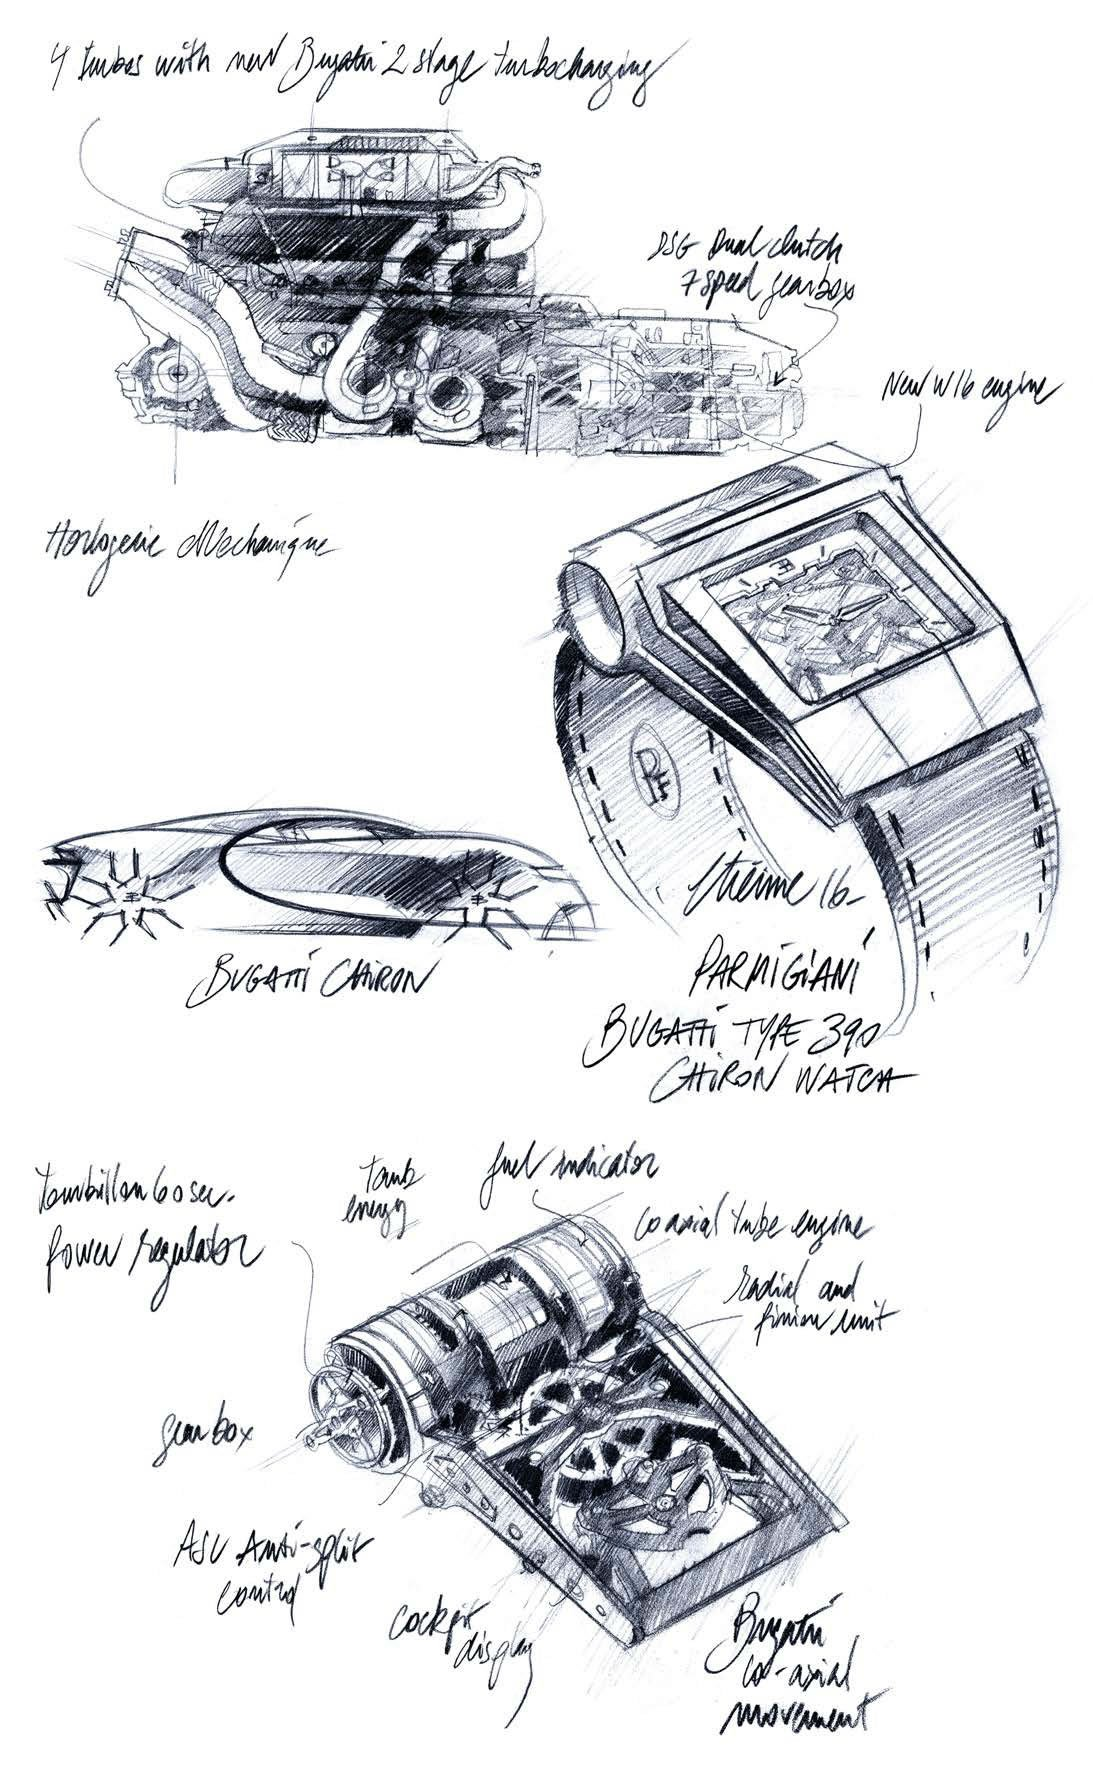 Parmigiani-Fleurier-PF-Bugatti-390-Concept-Watch (7)